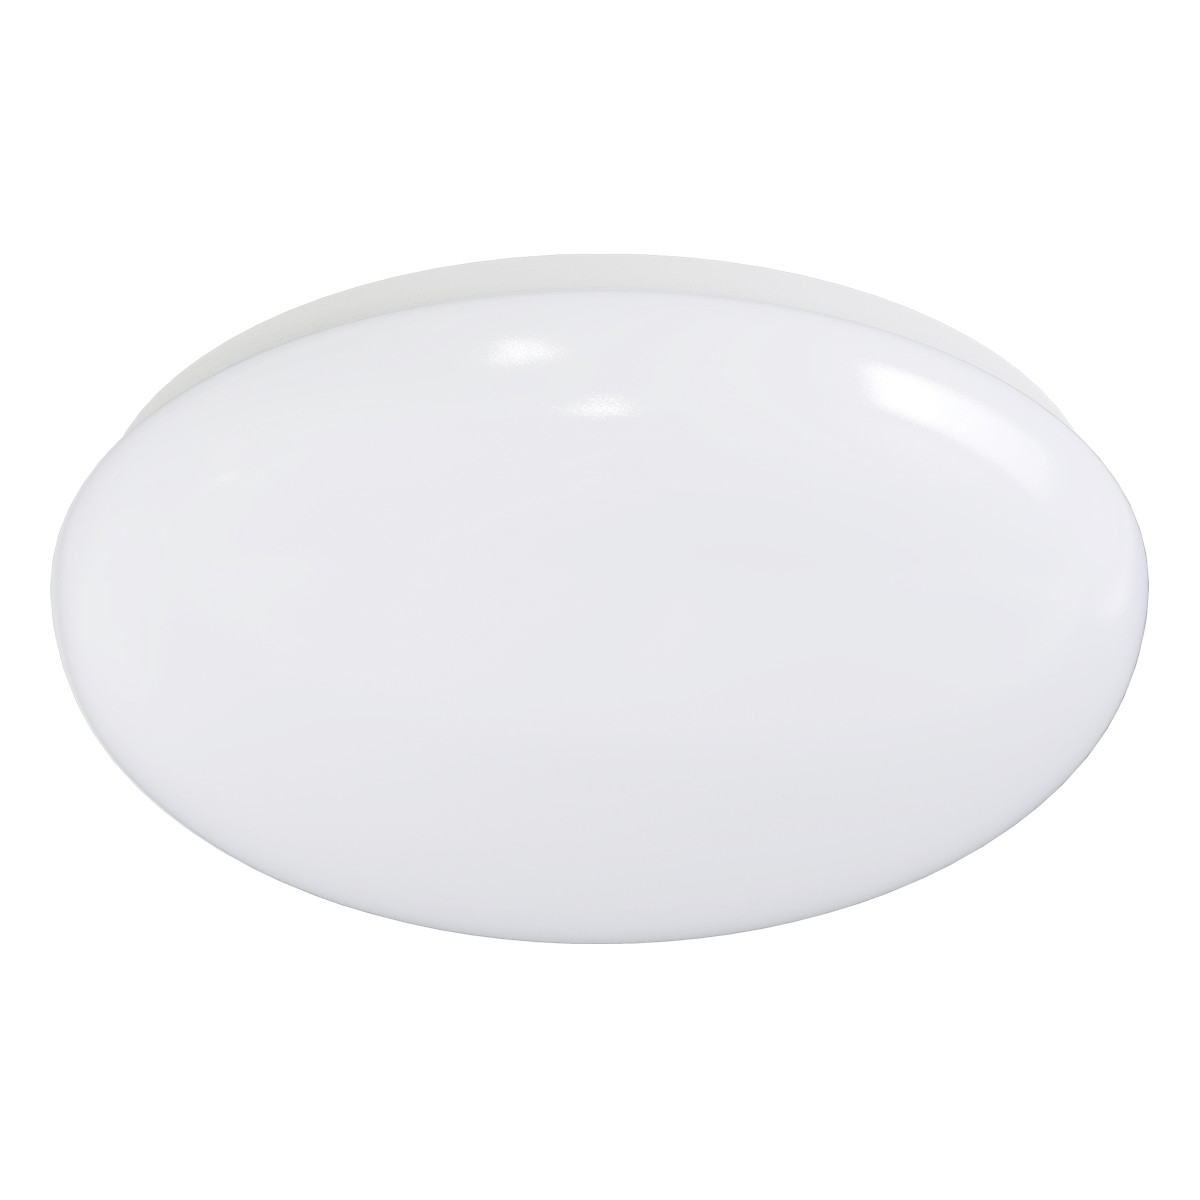 LED Plafondlamp met Bewegingssensor - Aigi - Opbouw Rond 12W - Warm Wit 3000K - 360° - Mat Wit Alumi